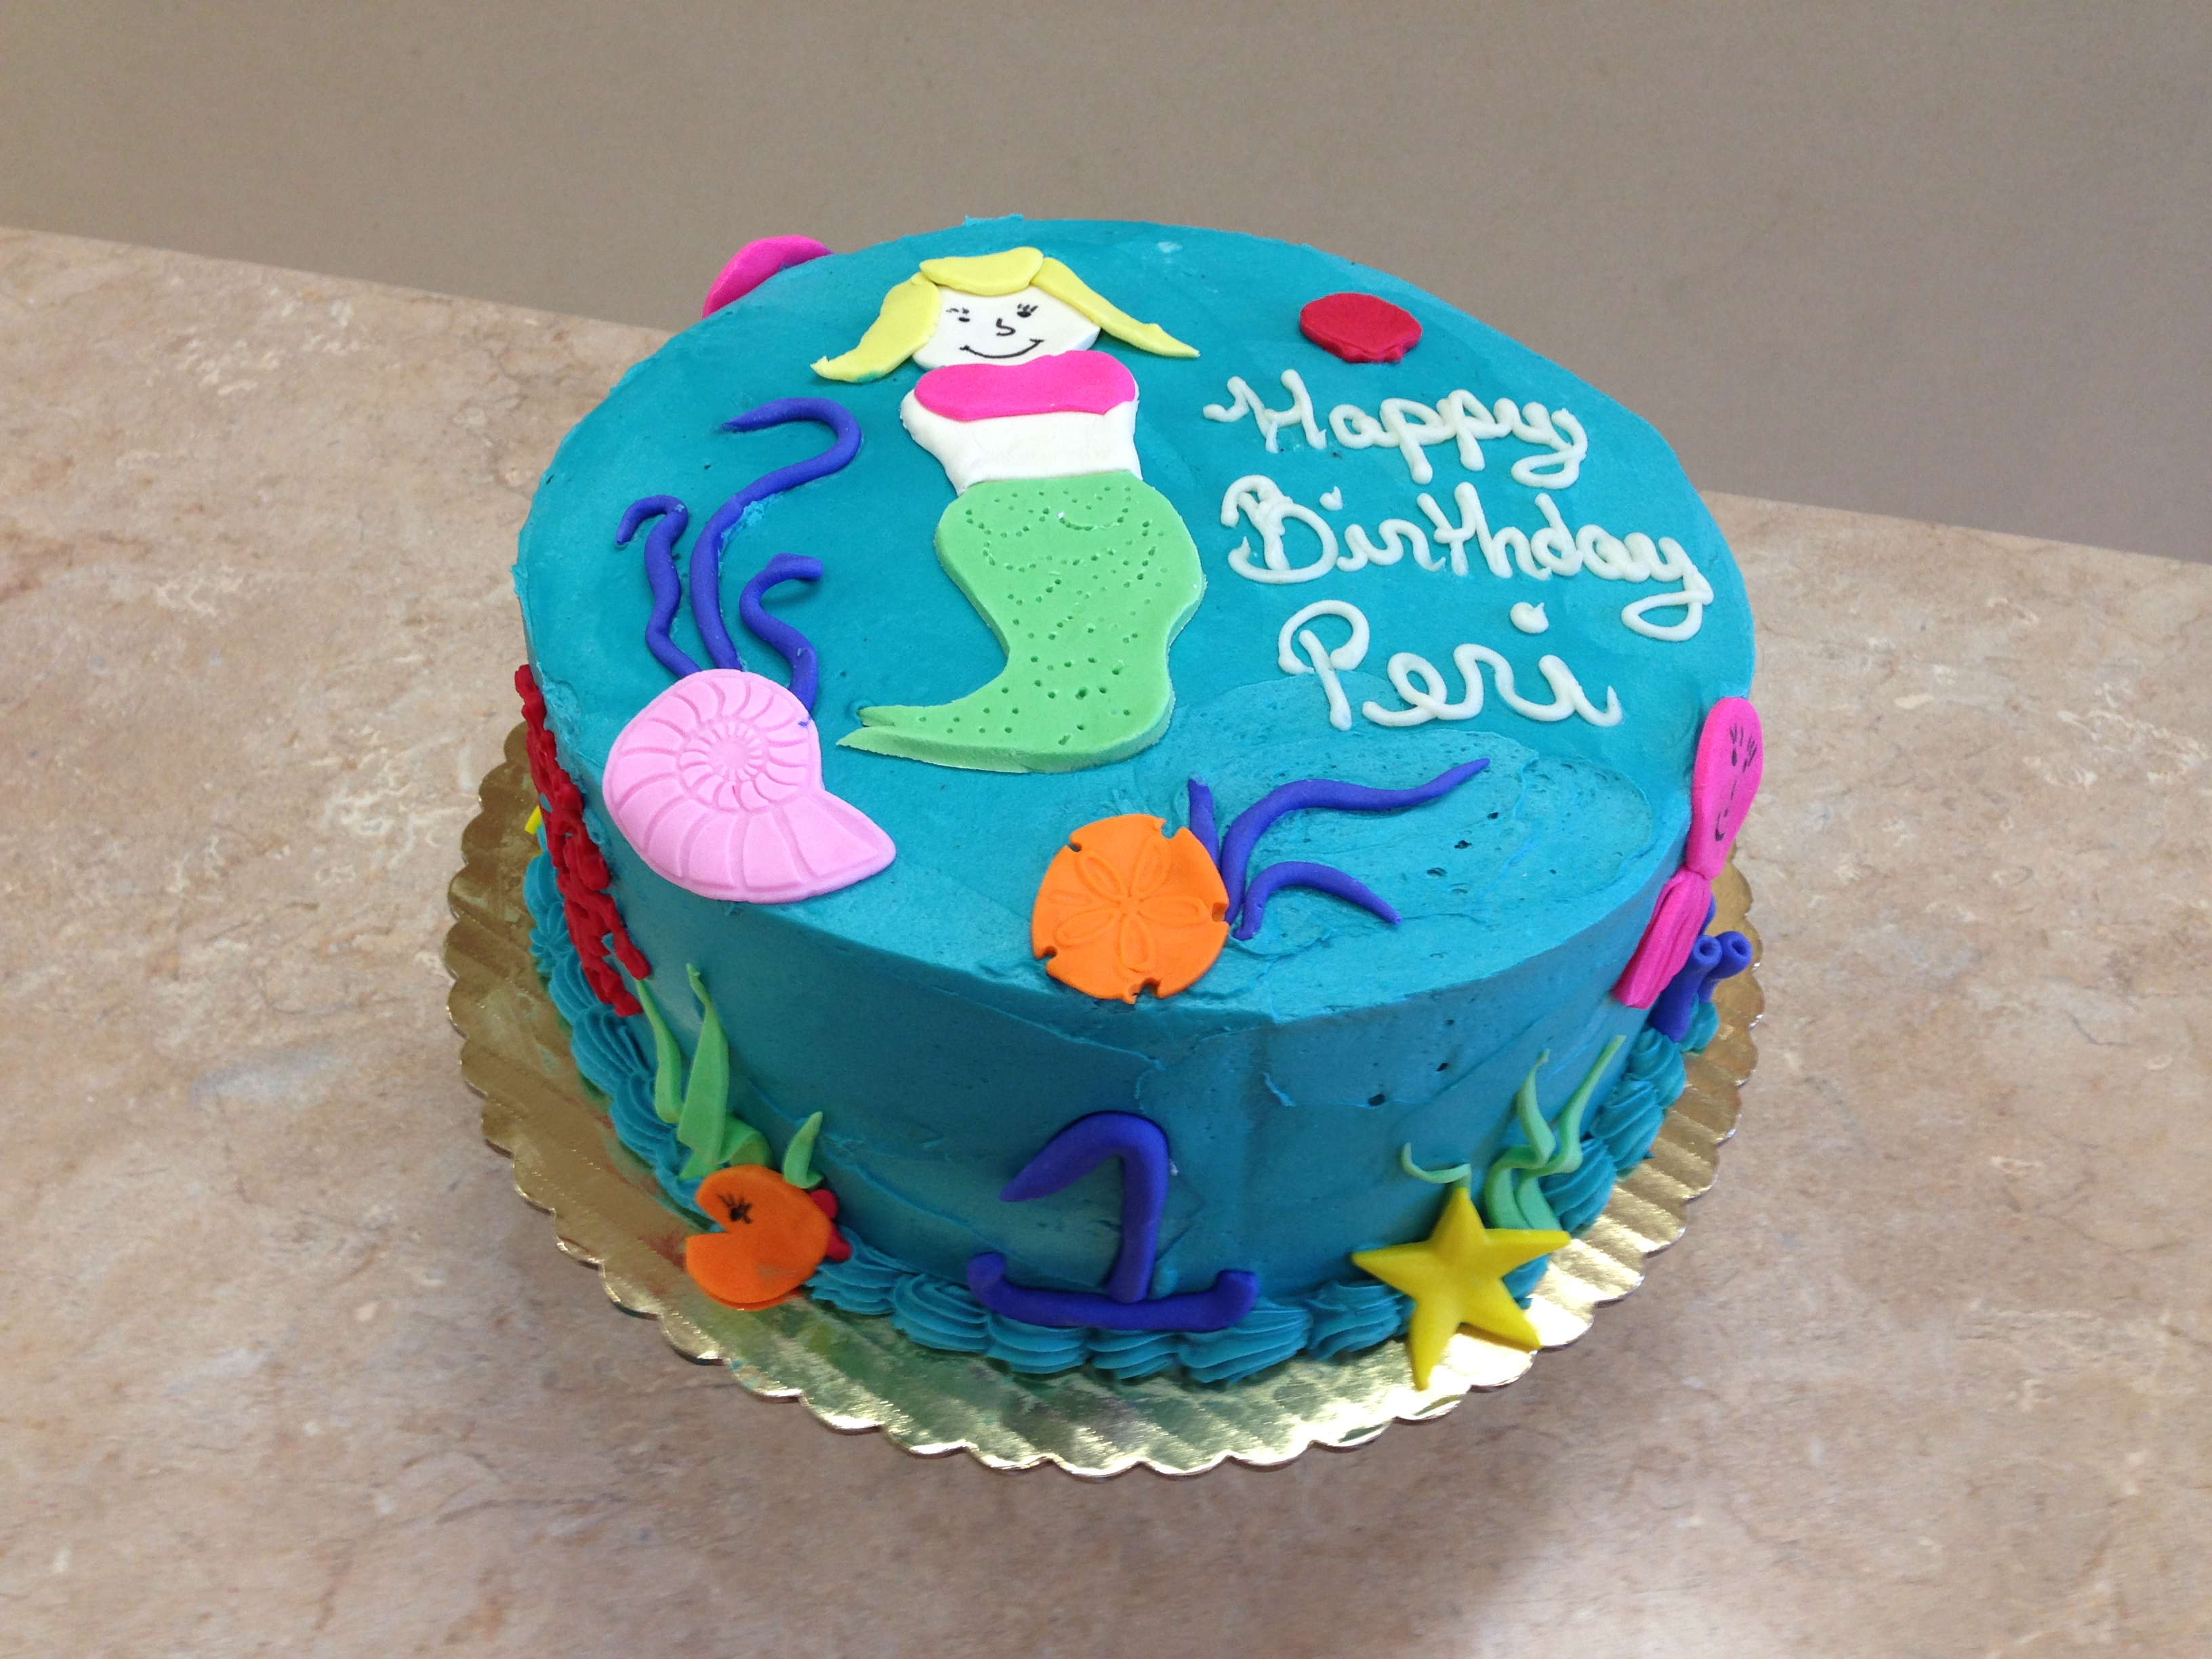 Mermaid Buttercream Cake